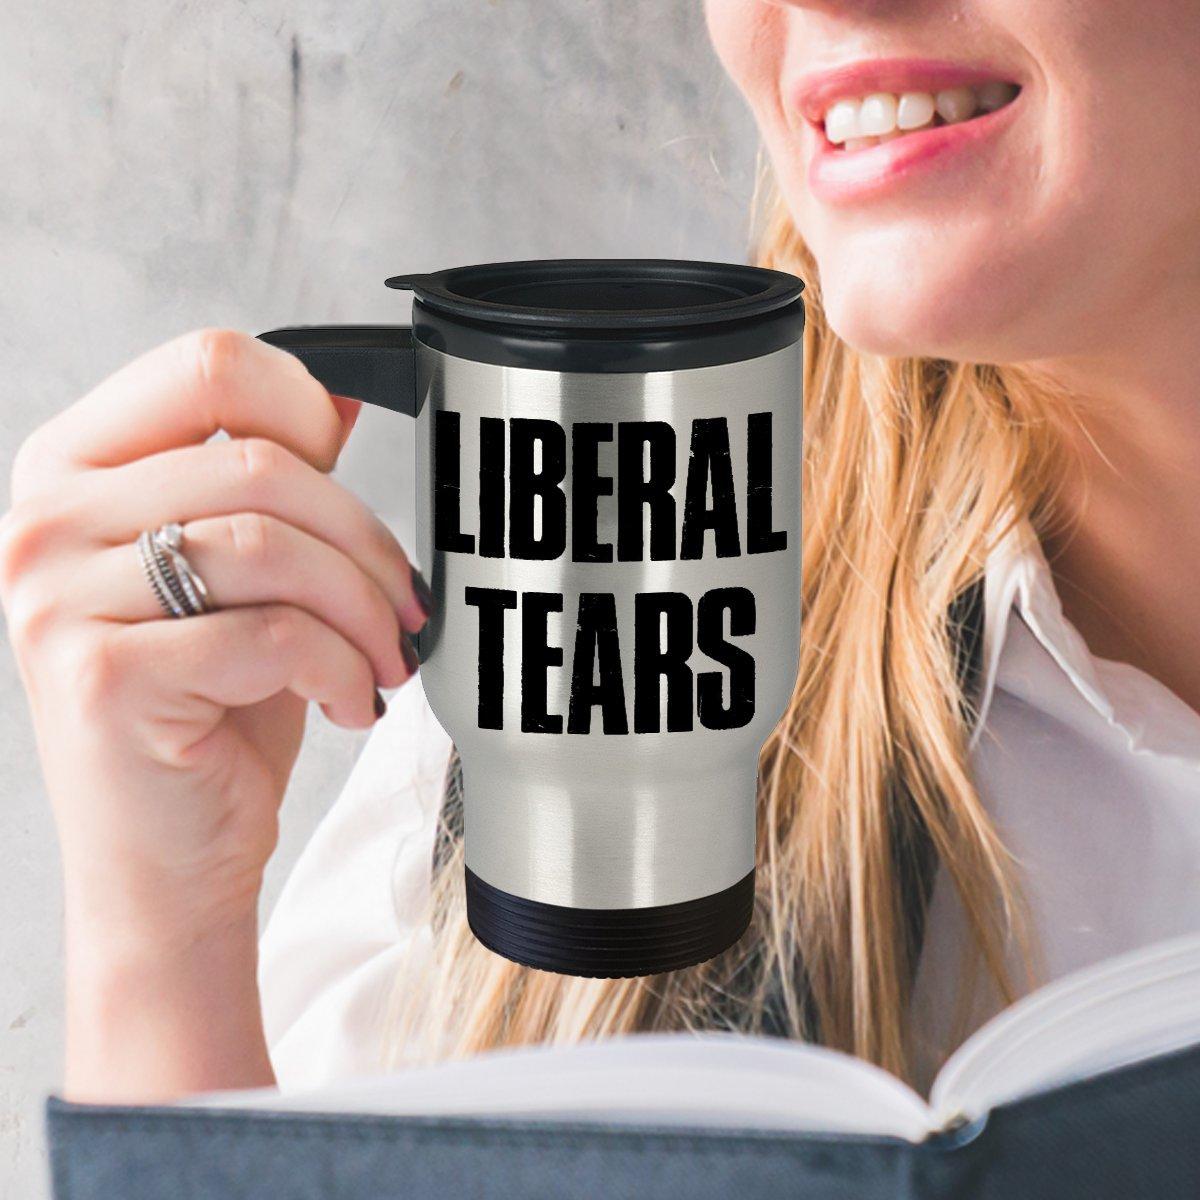 f5c979de67 Amazon.com  Liberal Tears Mug - Leftist Democrat Crying Cup